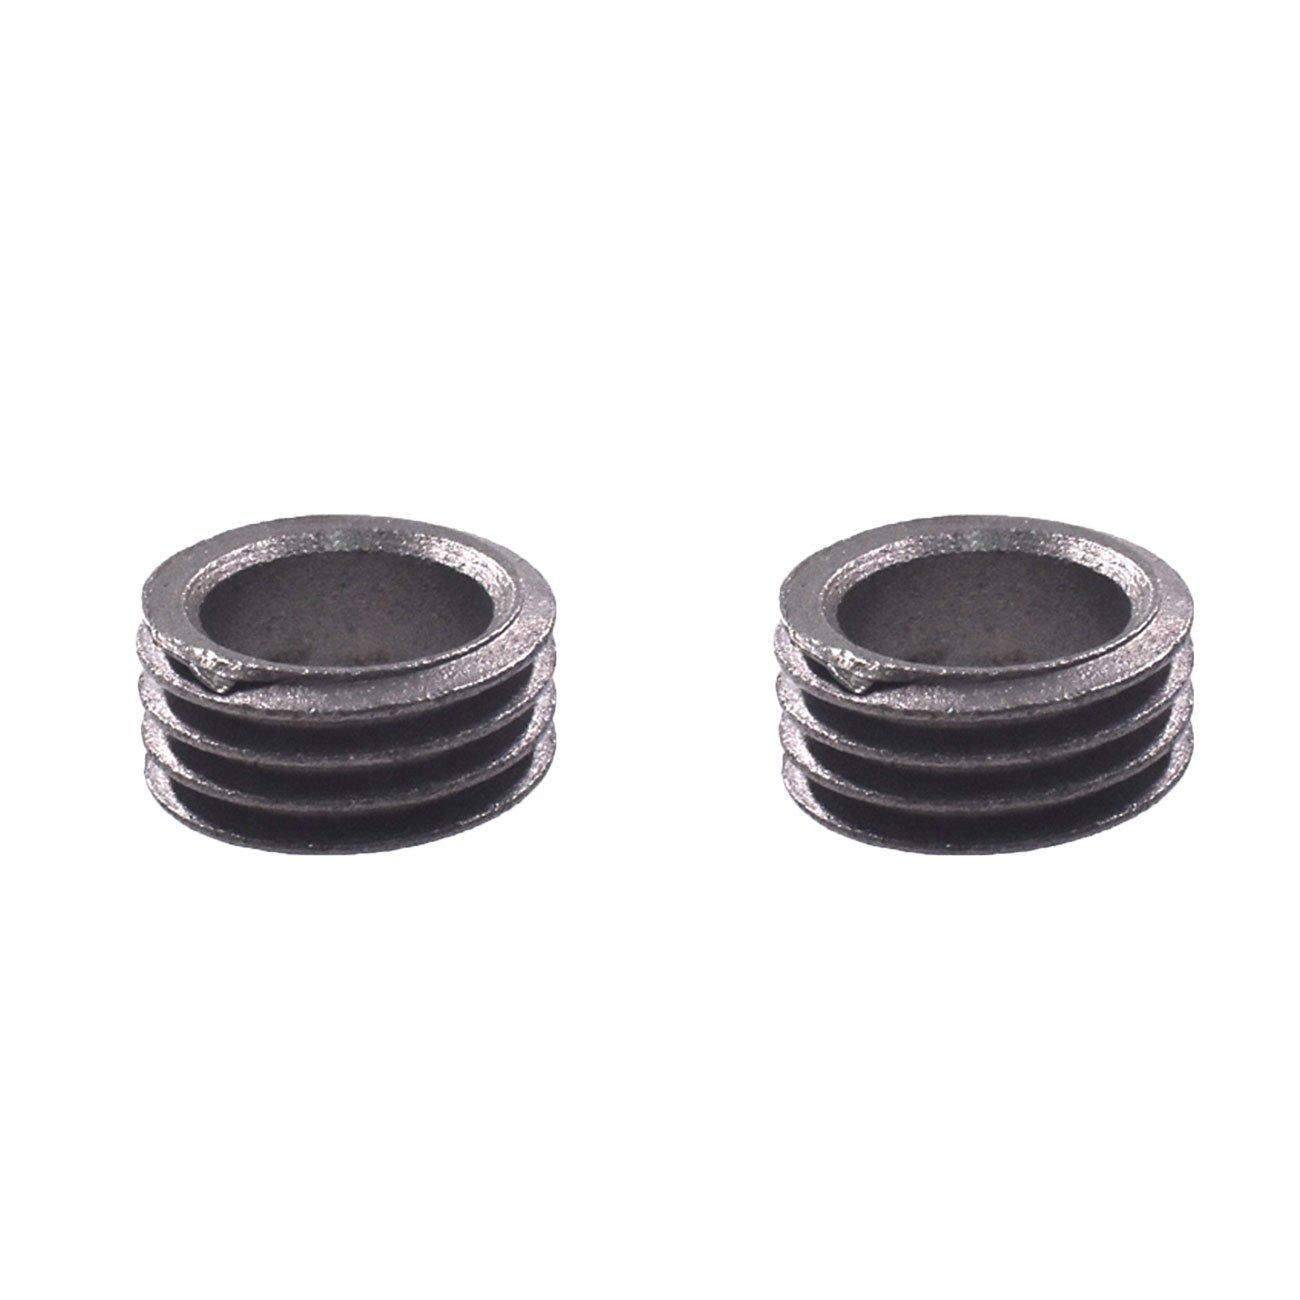 Hoover Elite Washing Machine 0900 T.O.C 3 Pin Part No 27854703 Genuine New